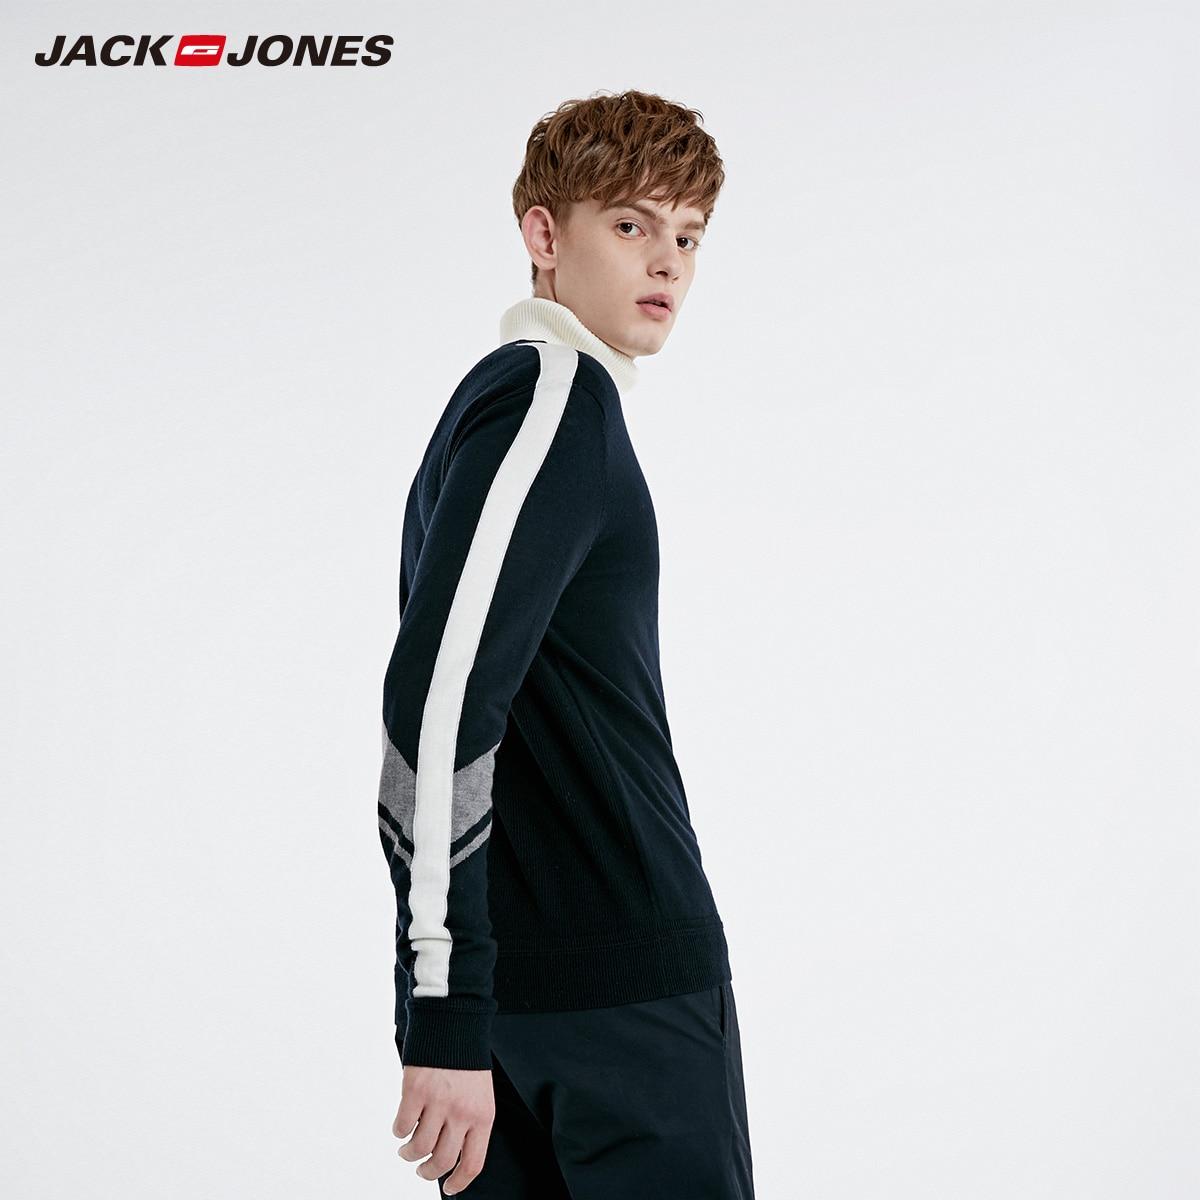 Jack Jones New spring men's casual long sleeve sweater   219125501